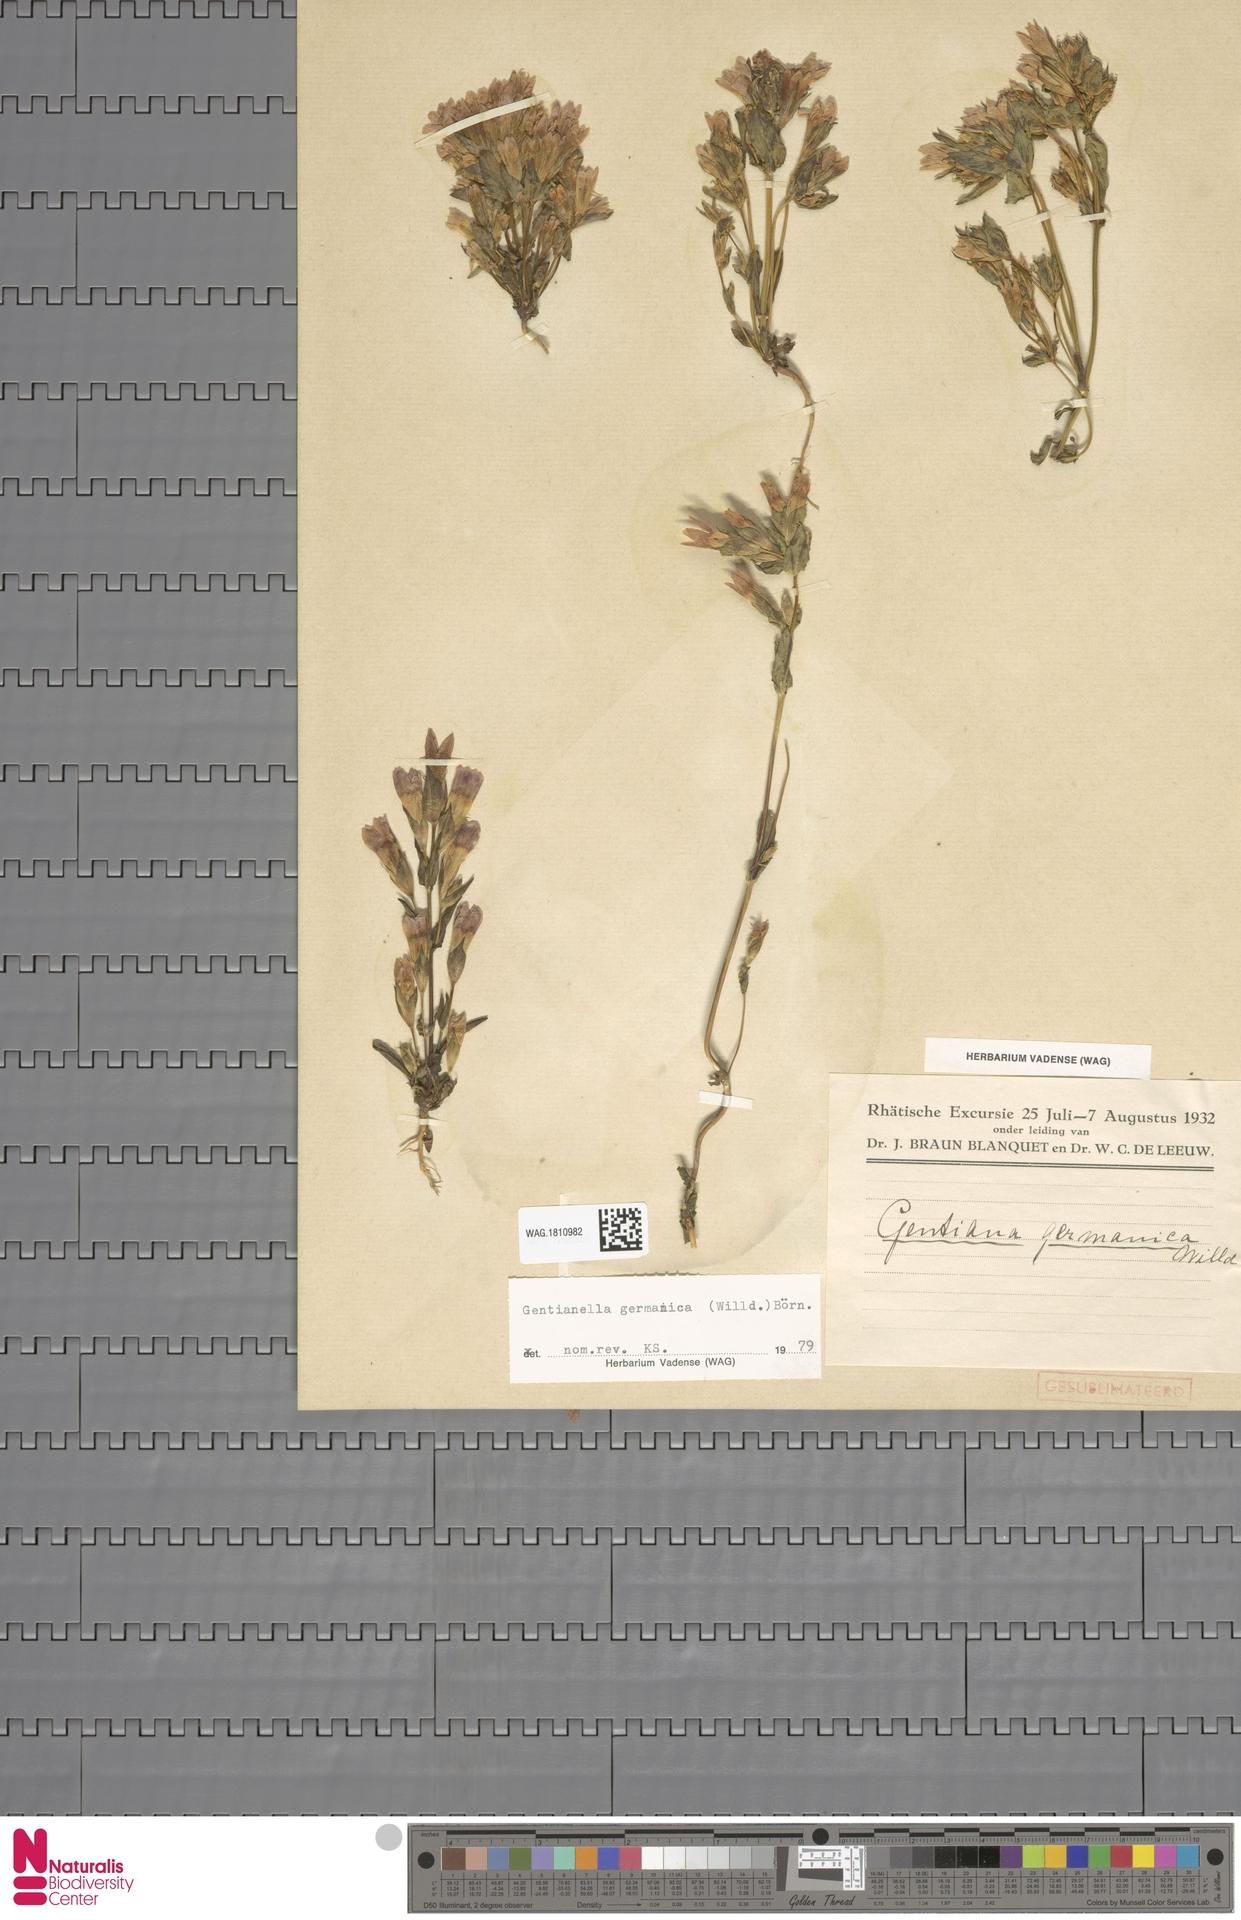 WAG.1810982 | Gentianella germanica (Willd.) E.F.Warb.